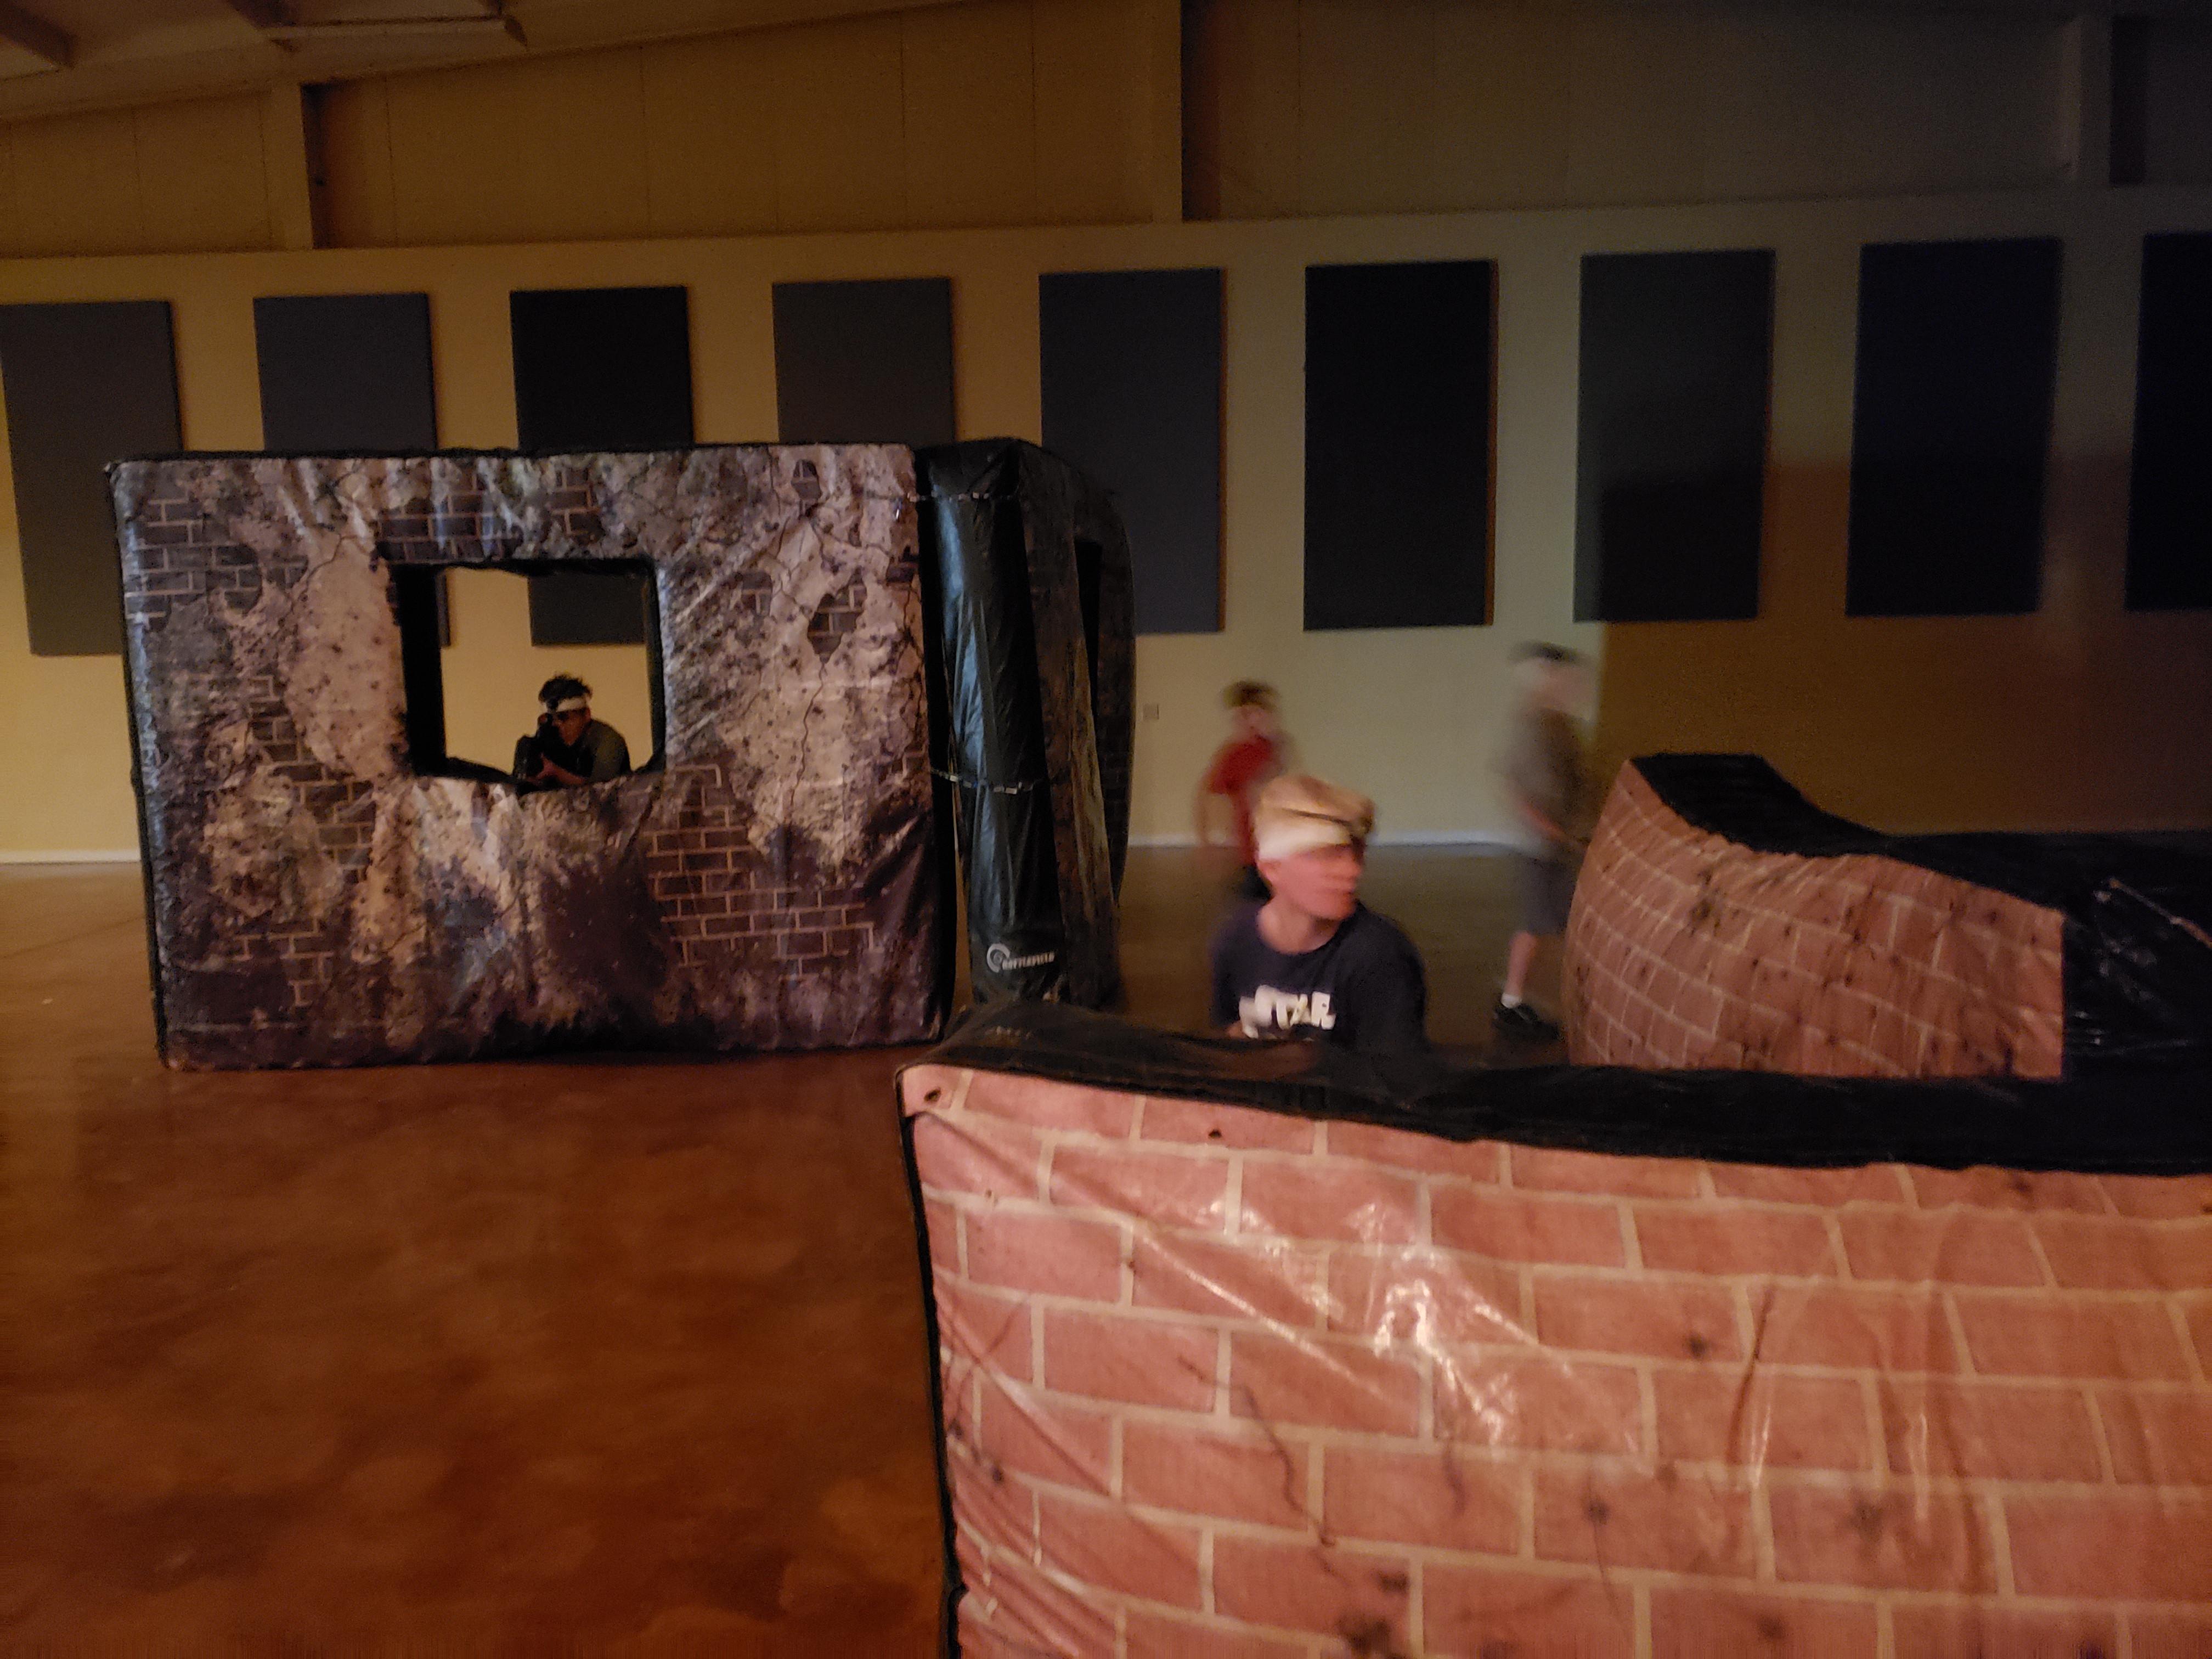 Guns & Large Bunkers